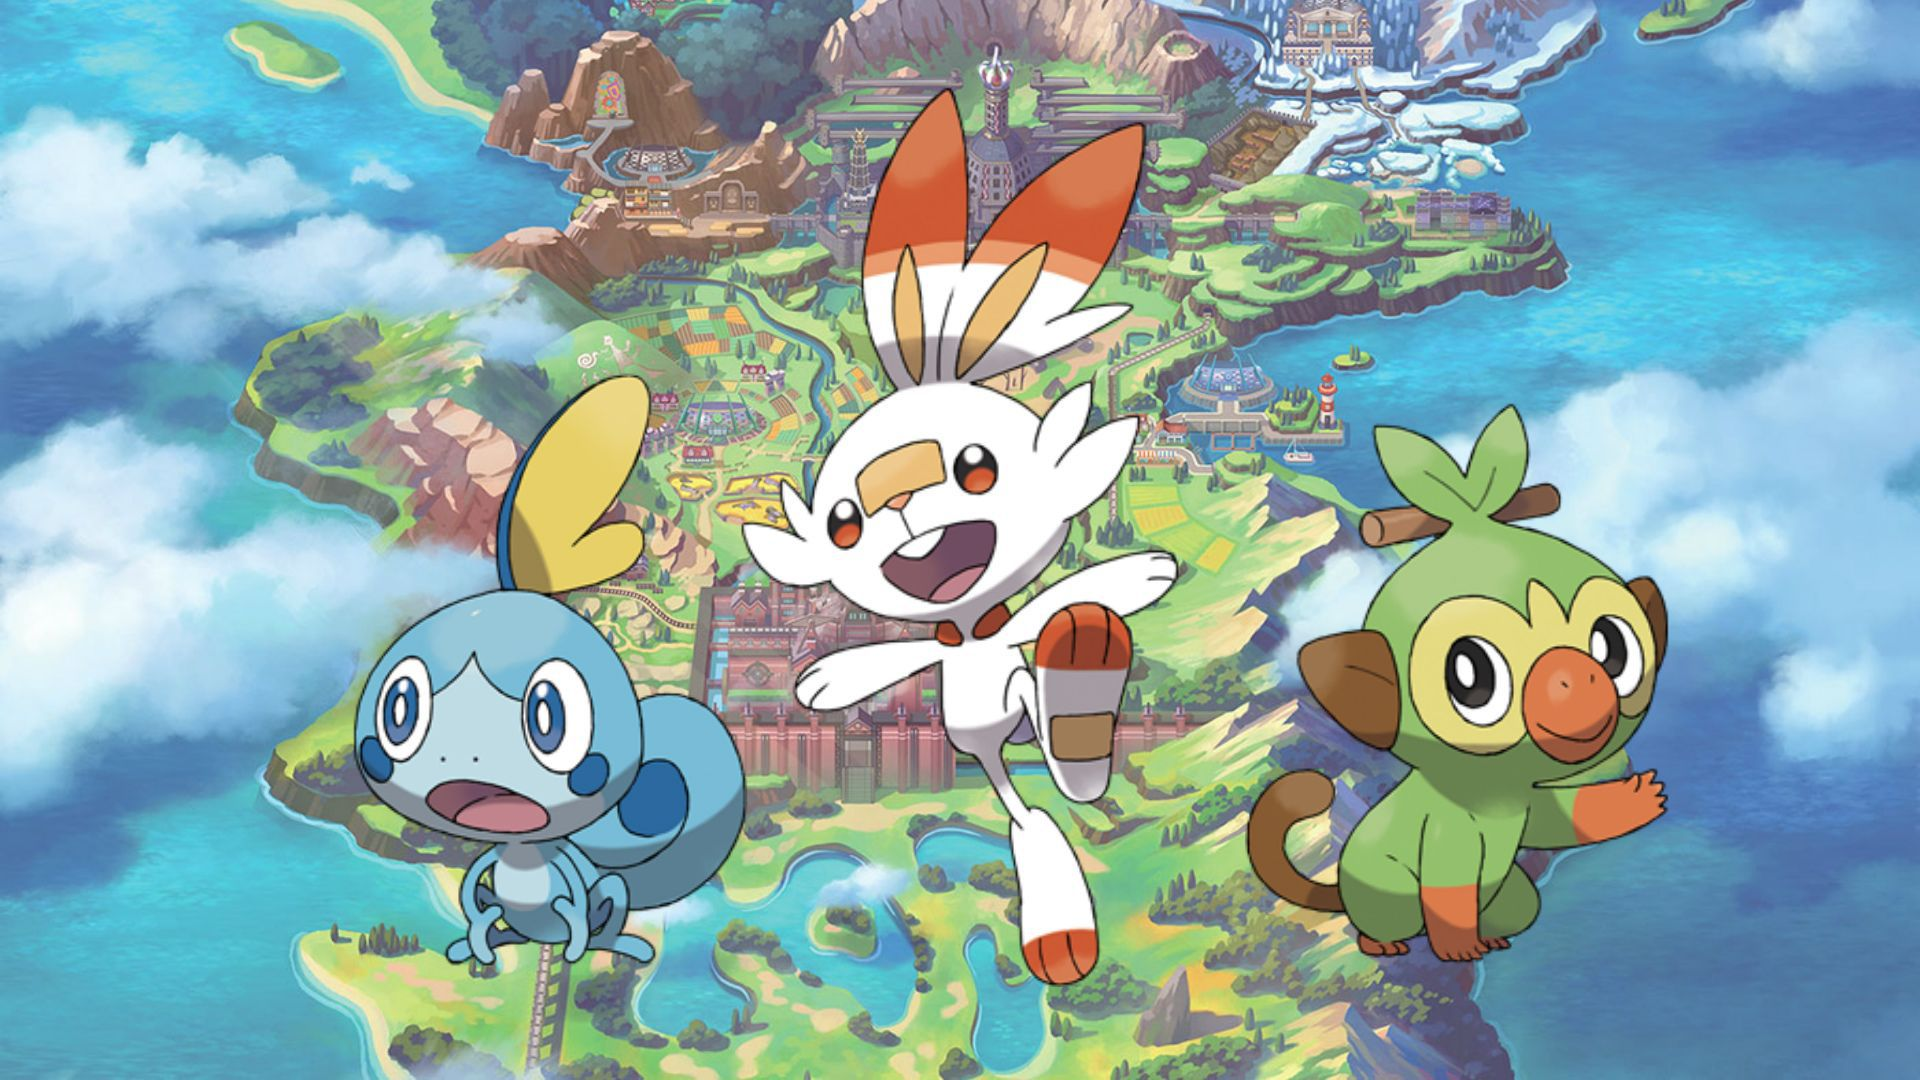 The most popular Pokémon ever according to a Reddit survey